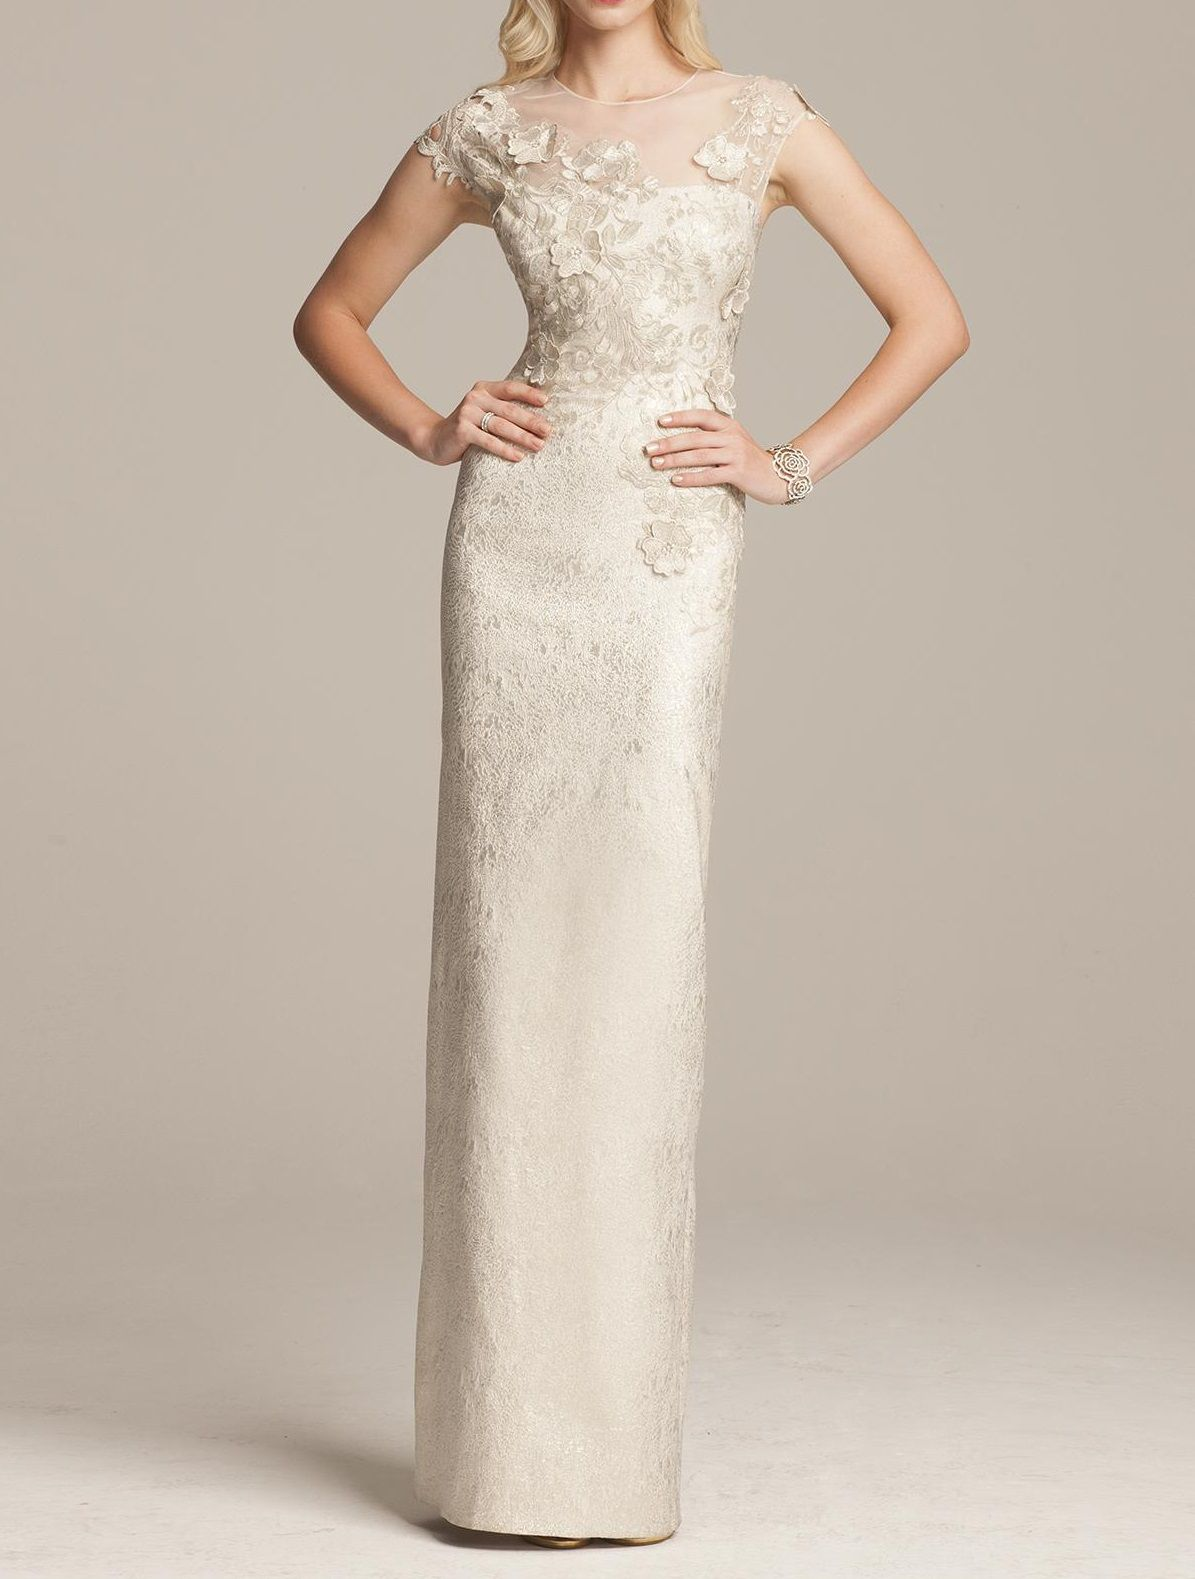 L-69 | 結婚式の母親ドレス M&V for mother